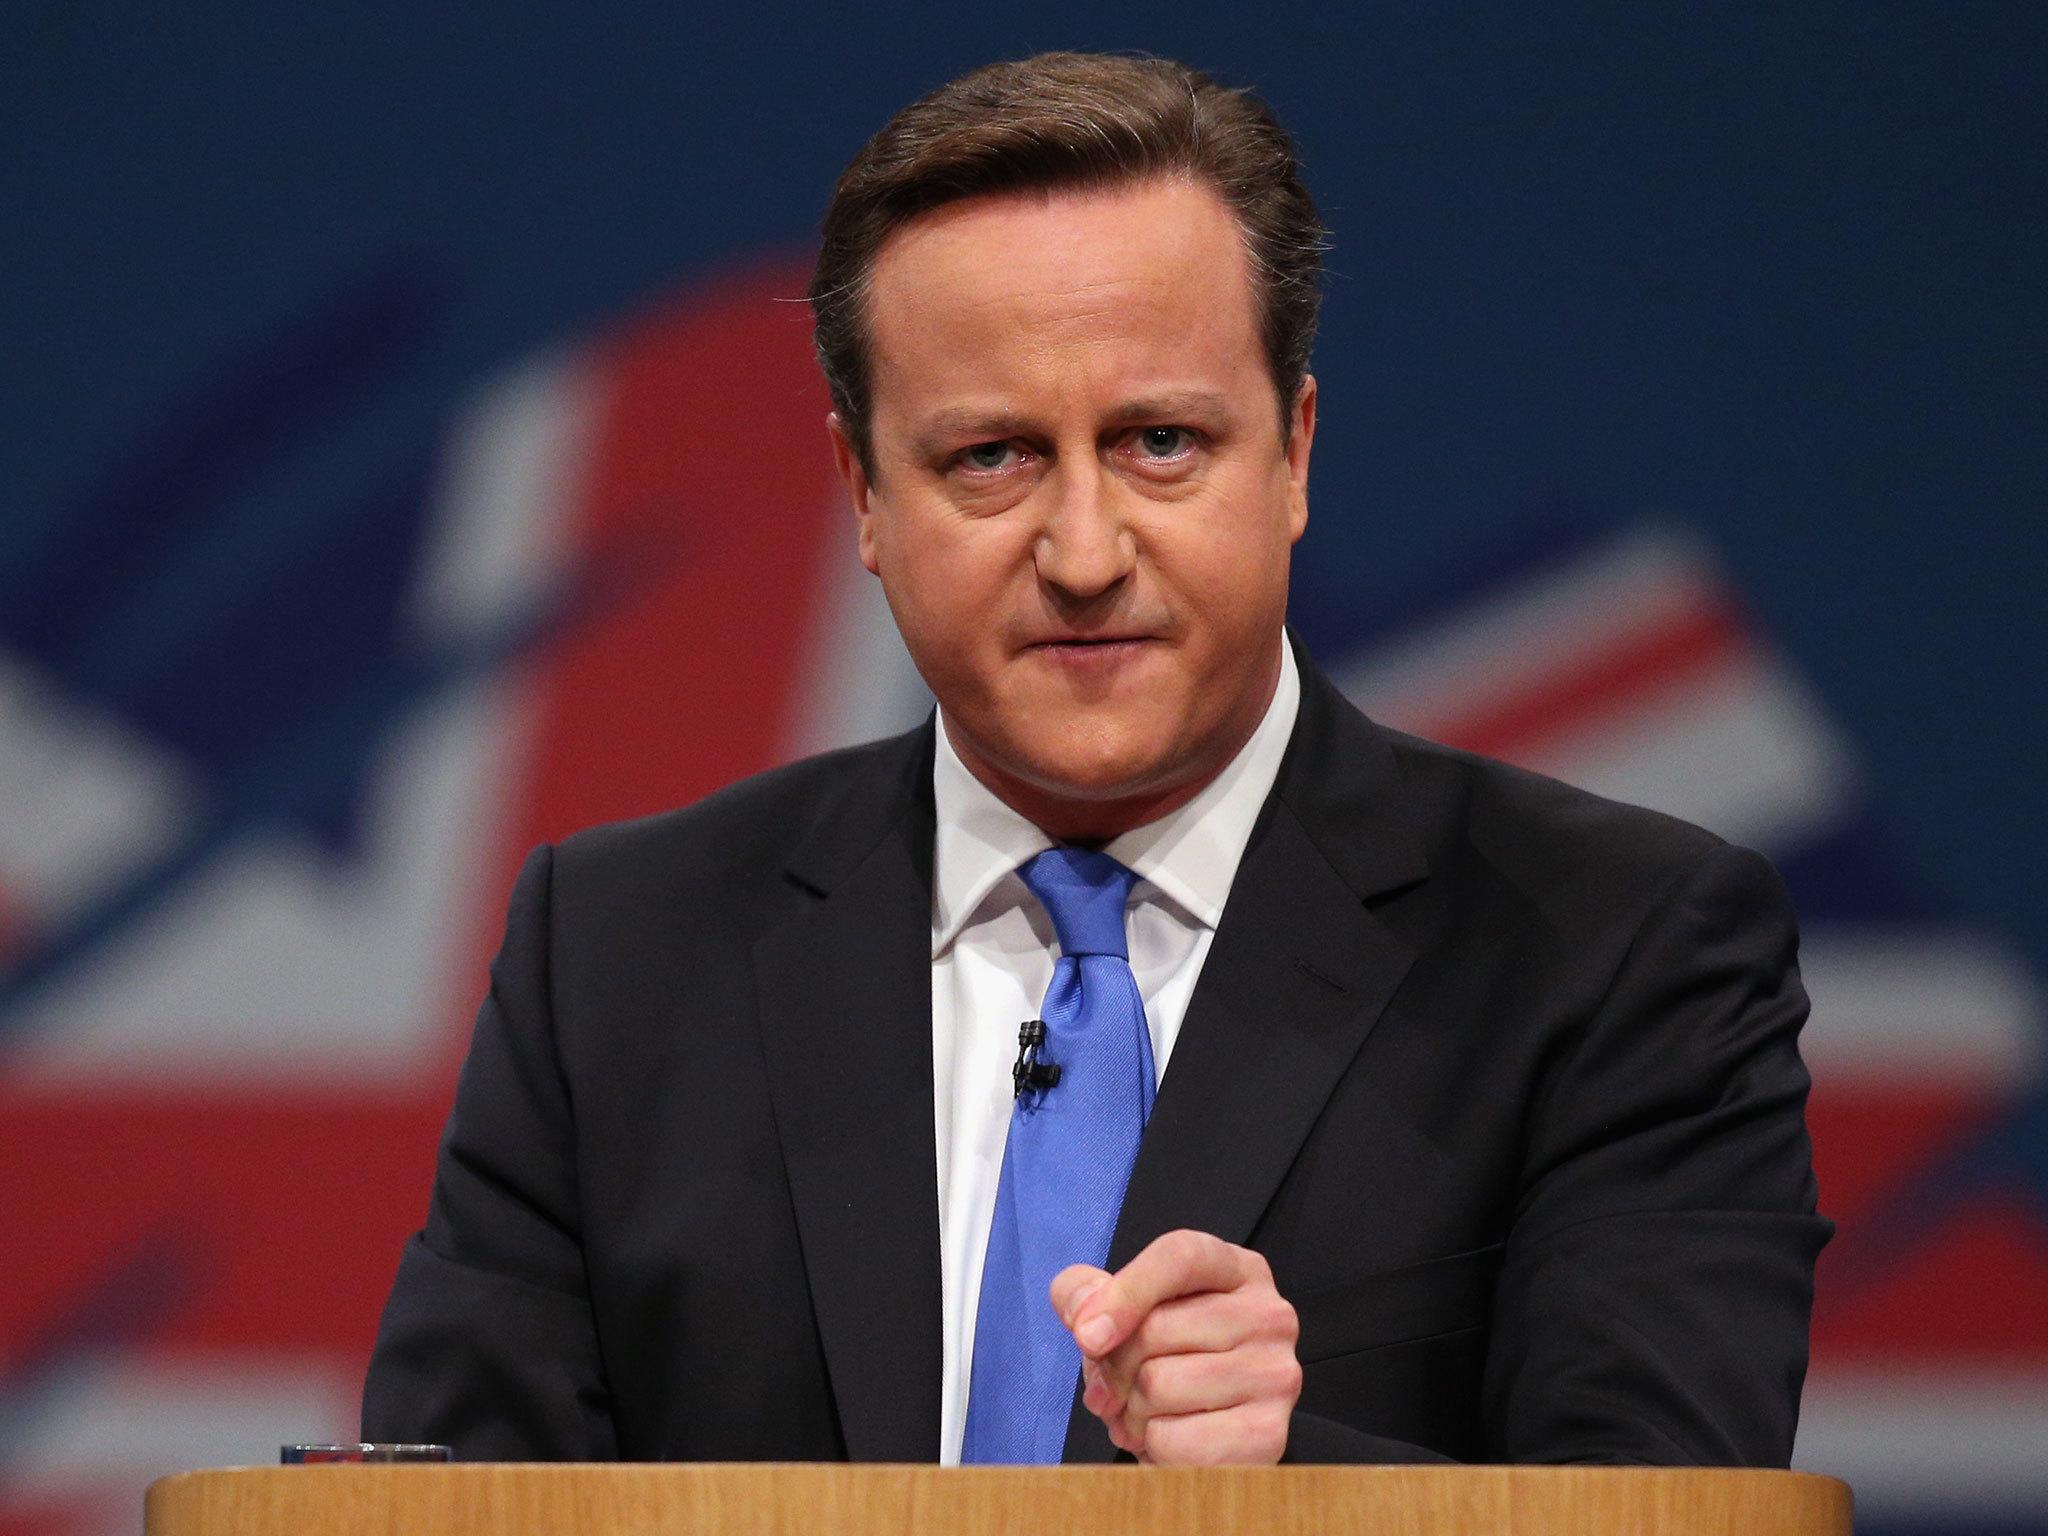 David Cameron Hd Background